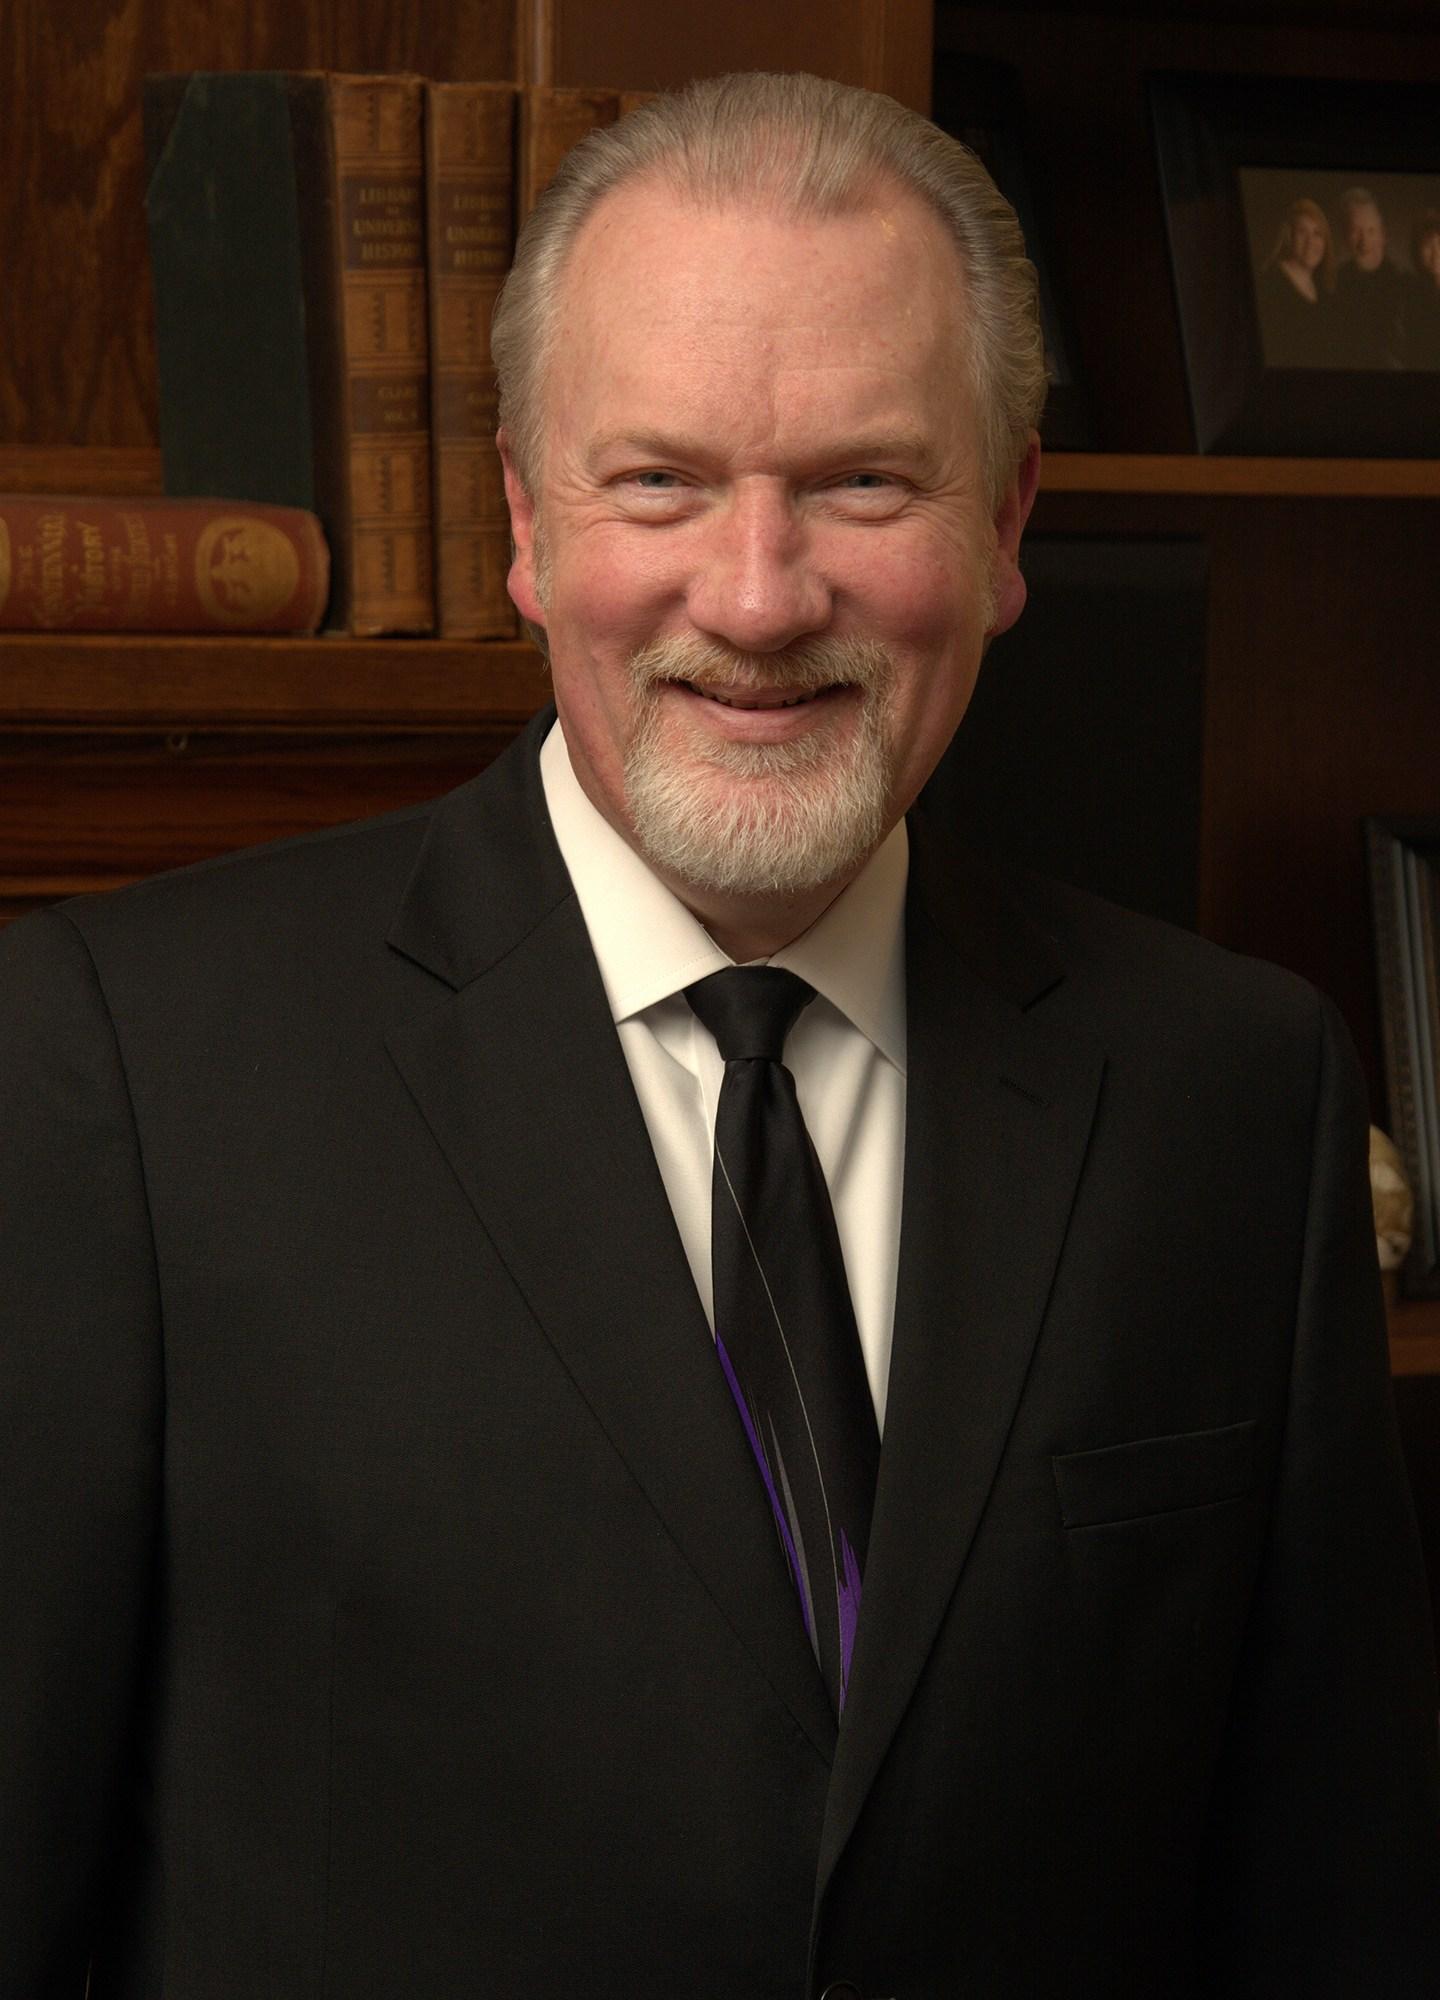 Paul Lowell Haines